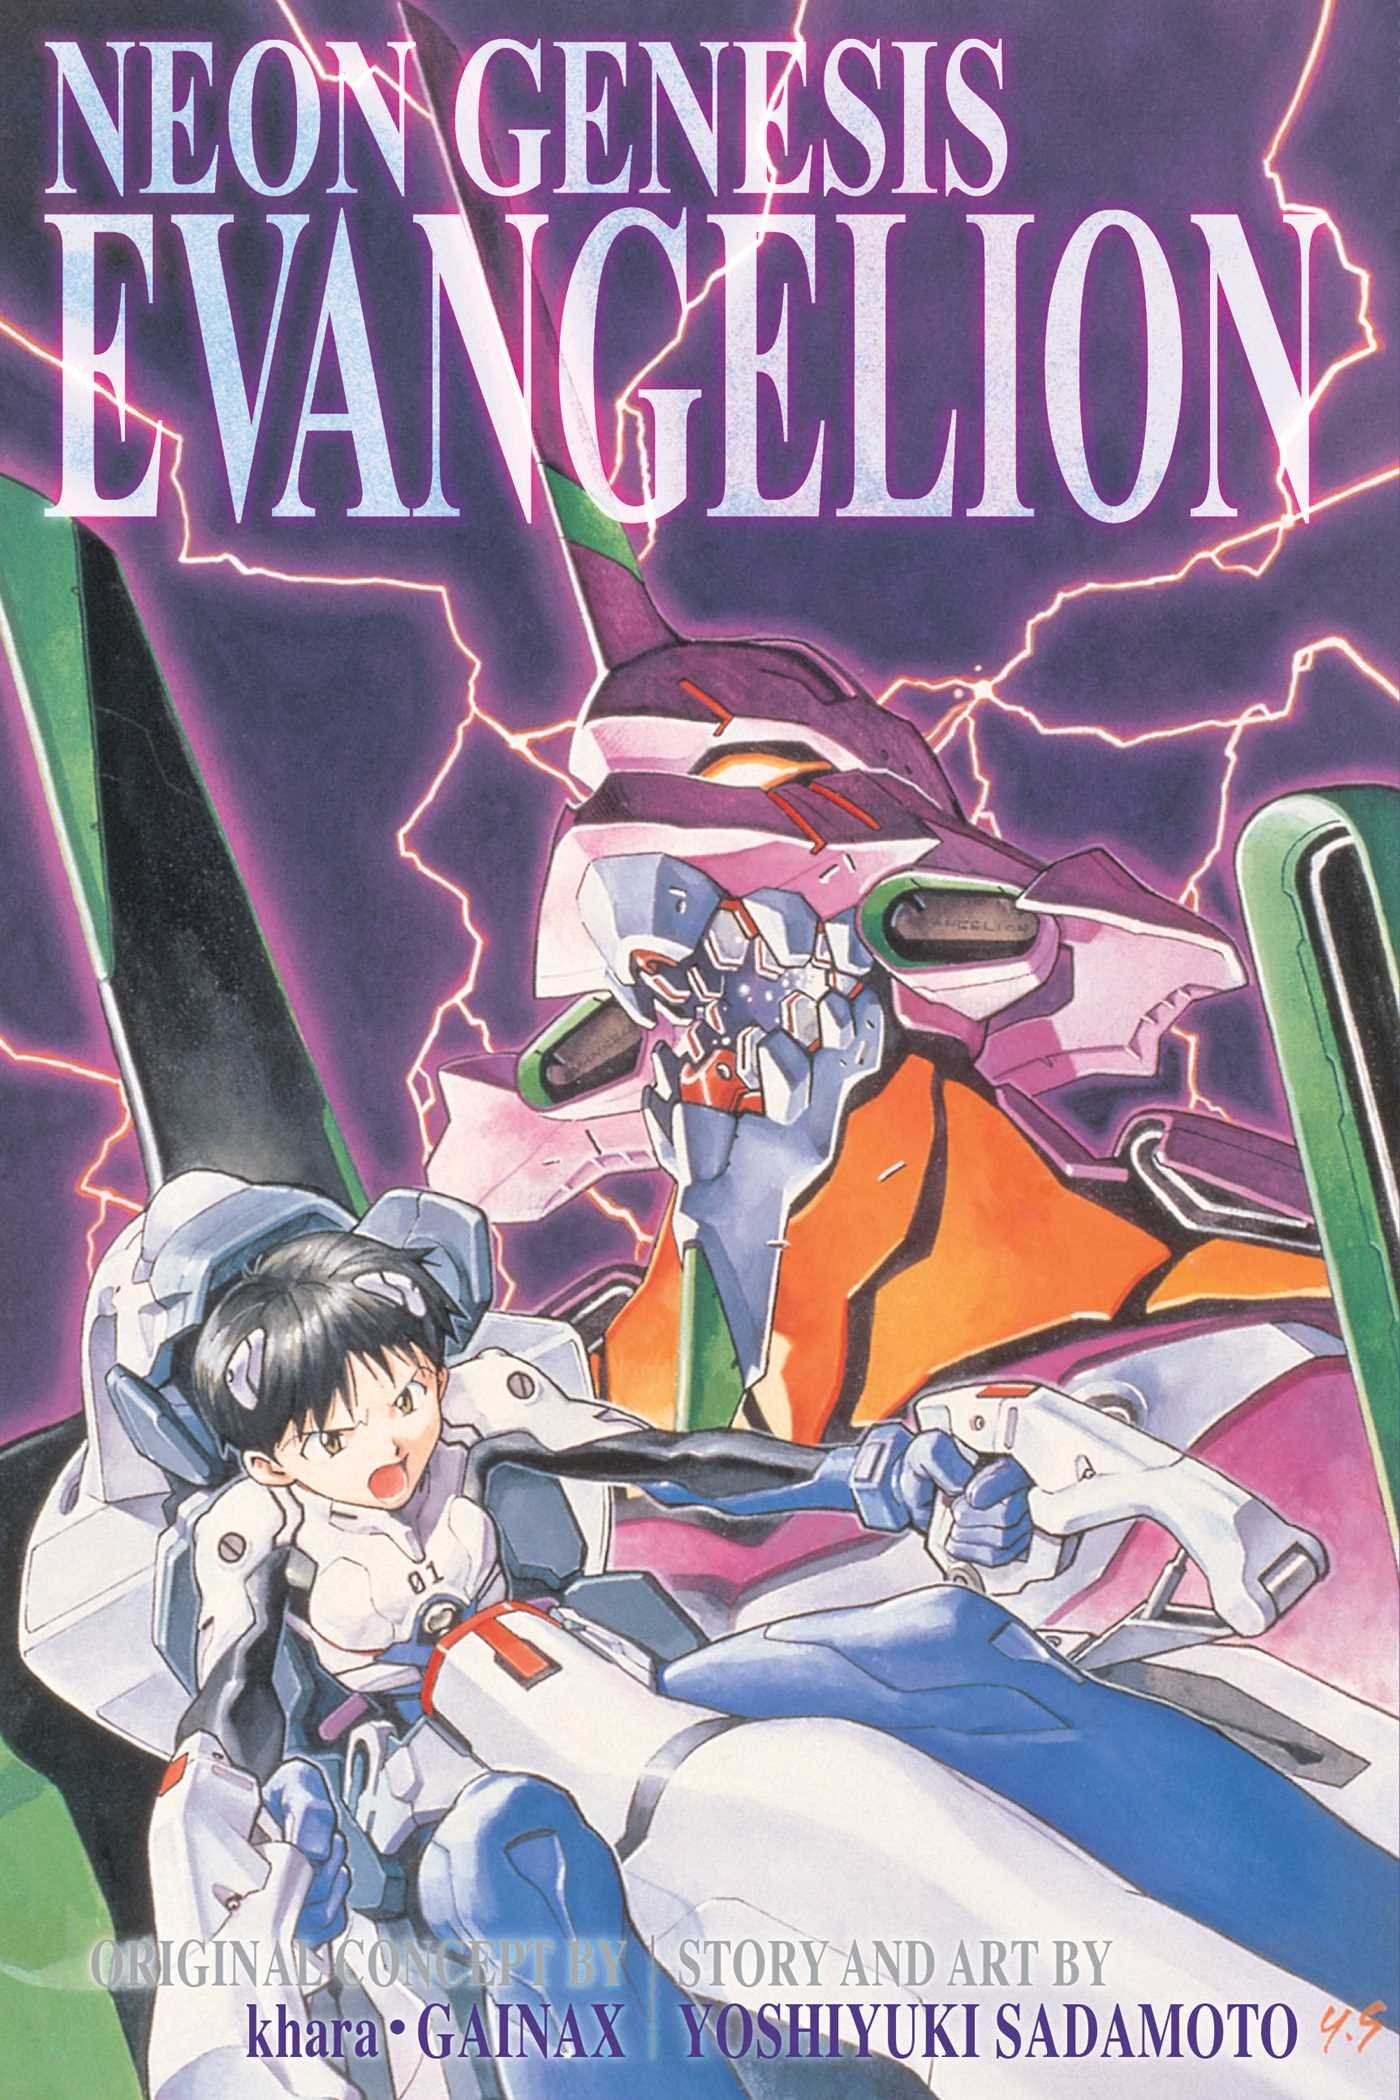 NEON GENESIS EVANGELION 3IN1 TP VOL 01 C 1 0 2 Neon Genesis Evangelion 3 In Edition Amazoncouk Yoshiyuki Sadamoto Books